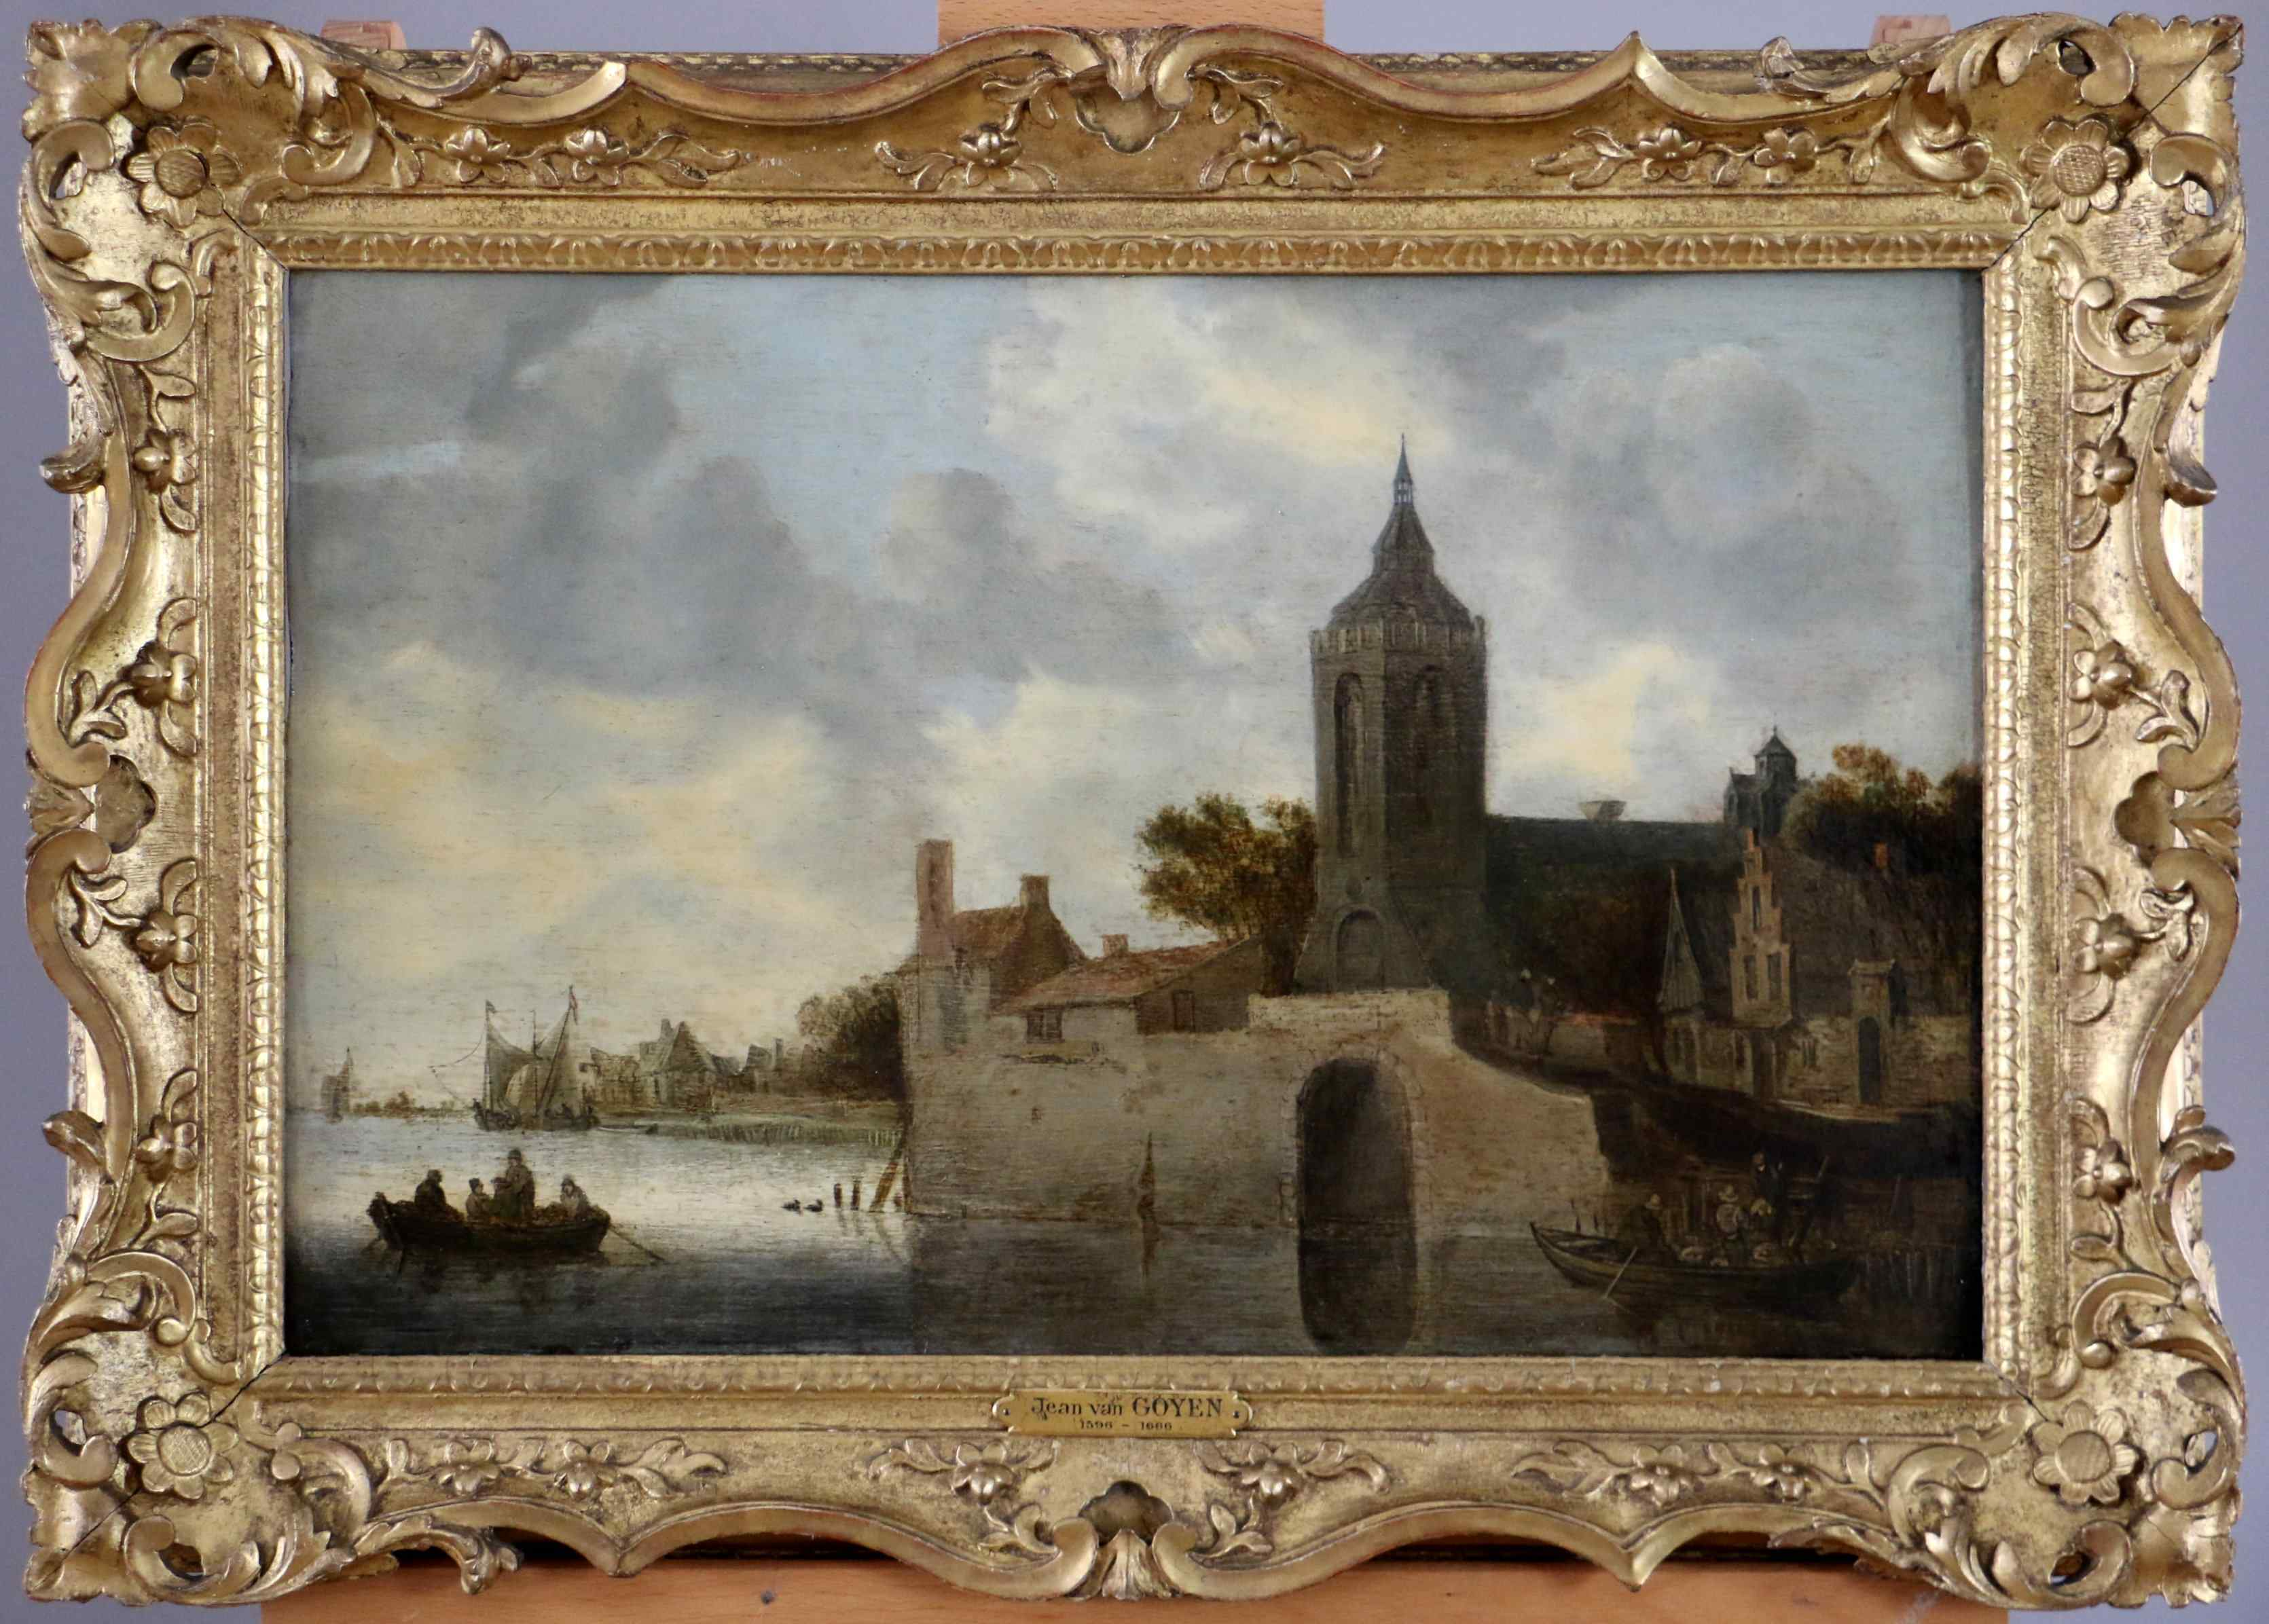 Scuola olandese del XVII secolo, Joseph van Goye